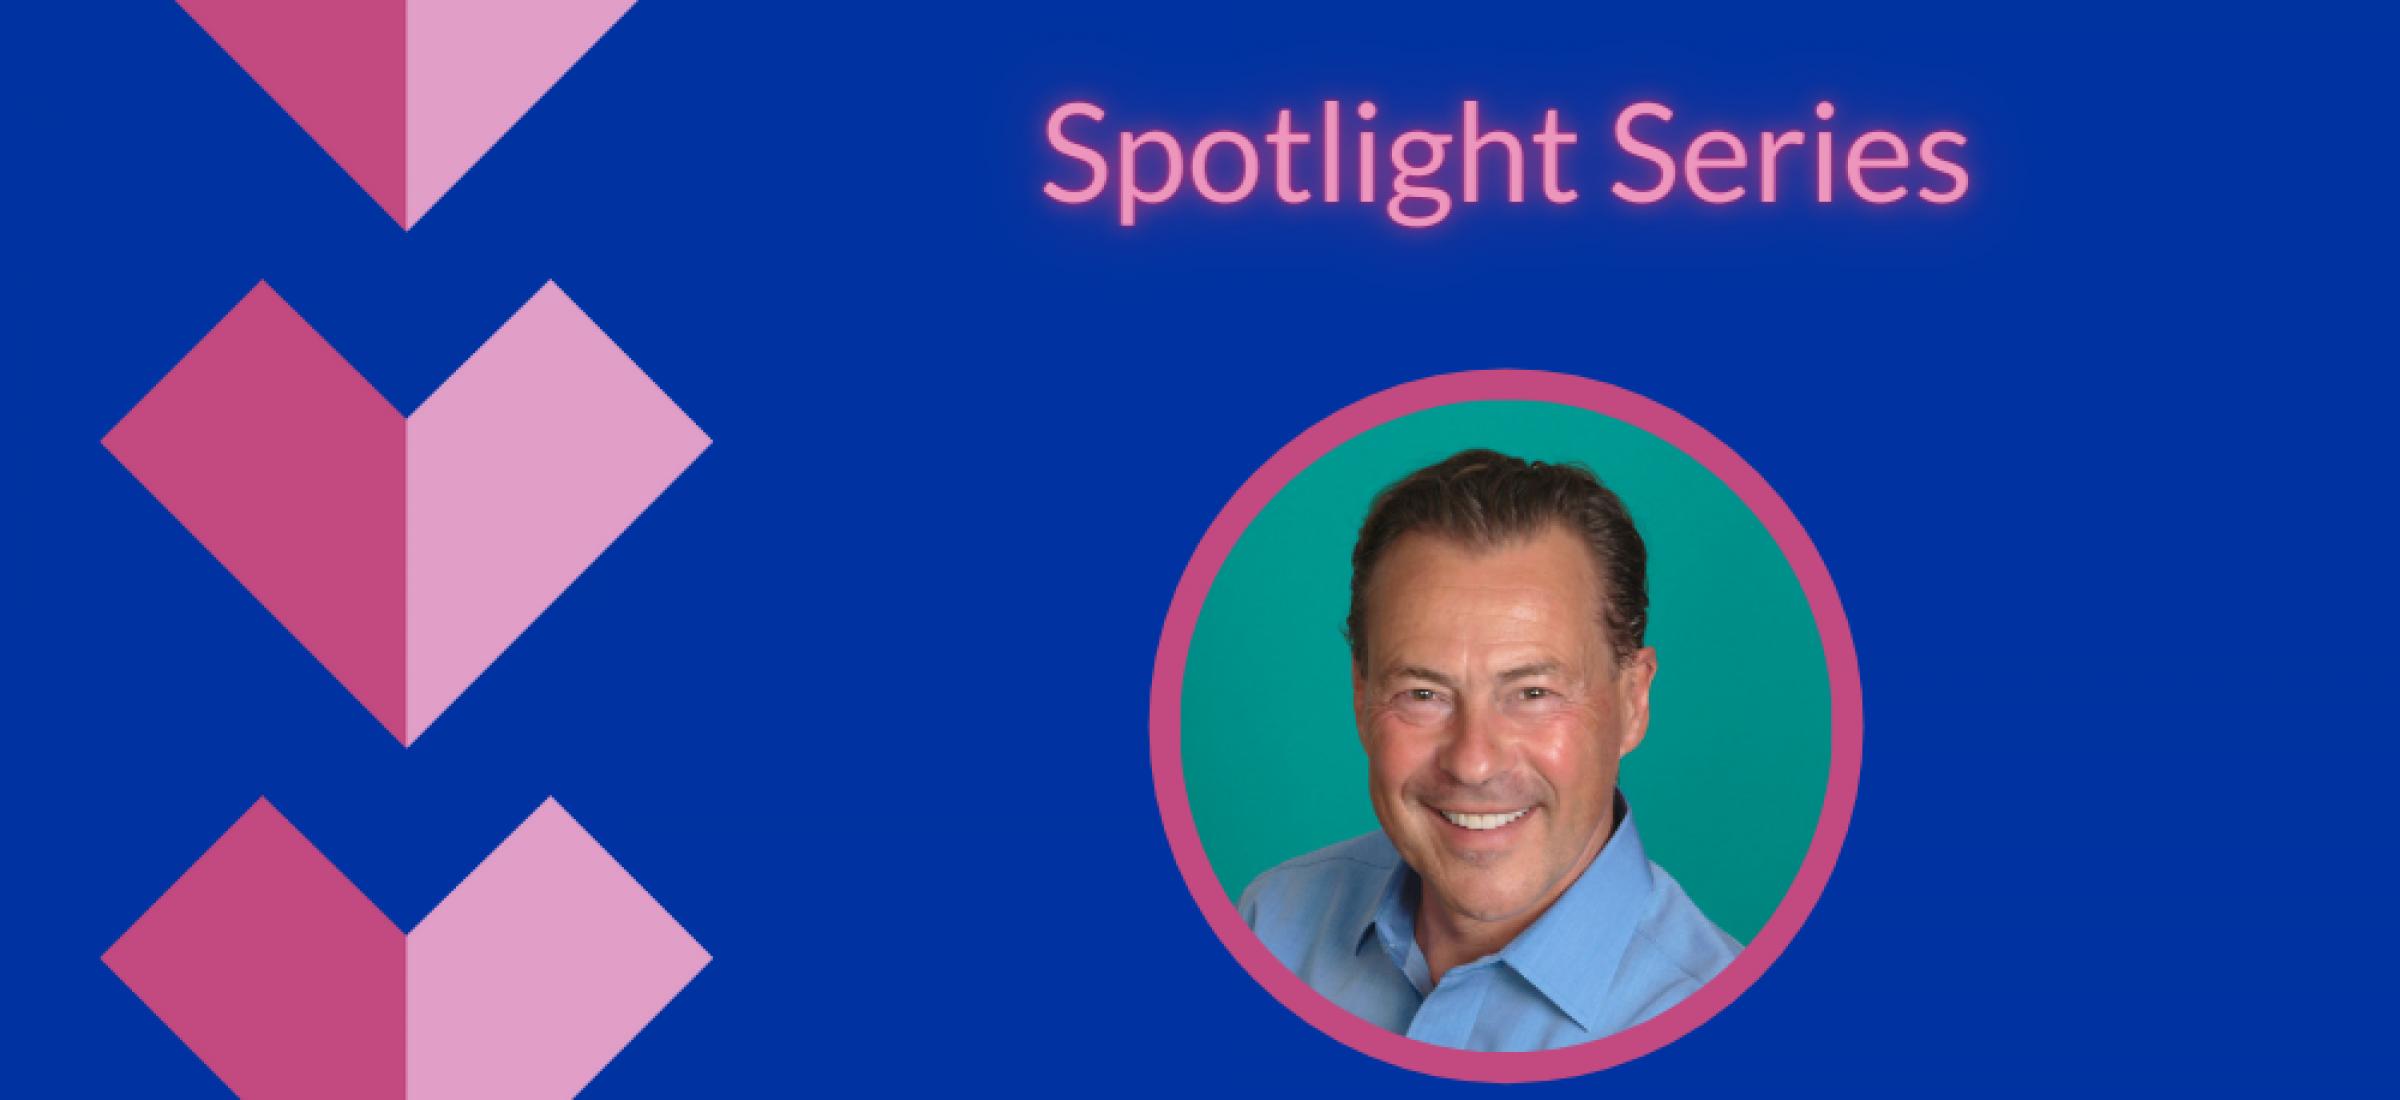 Uwe Spotlight Series